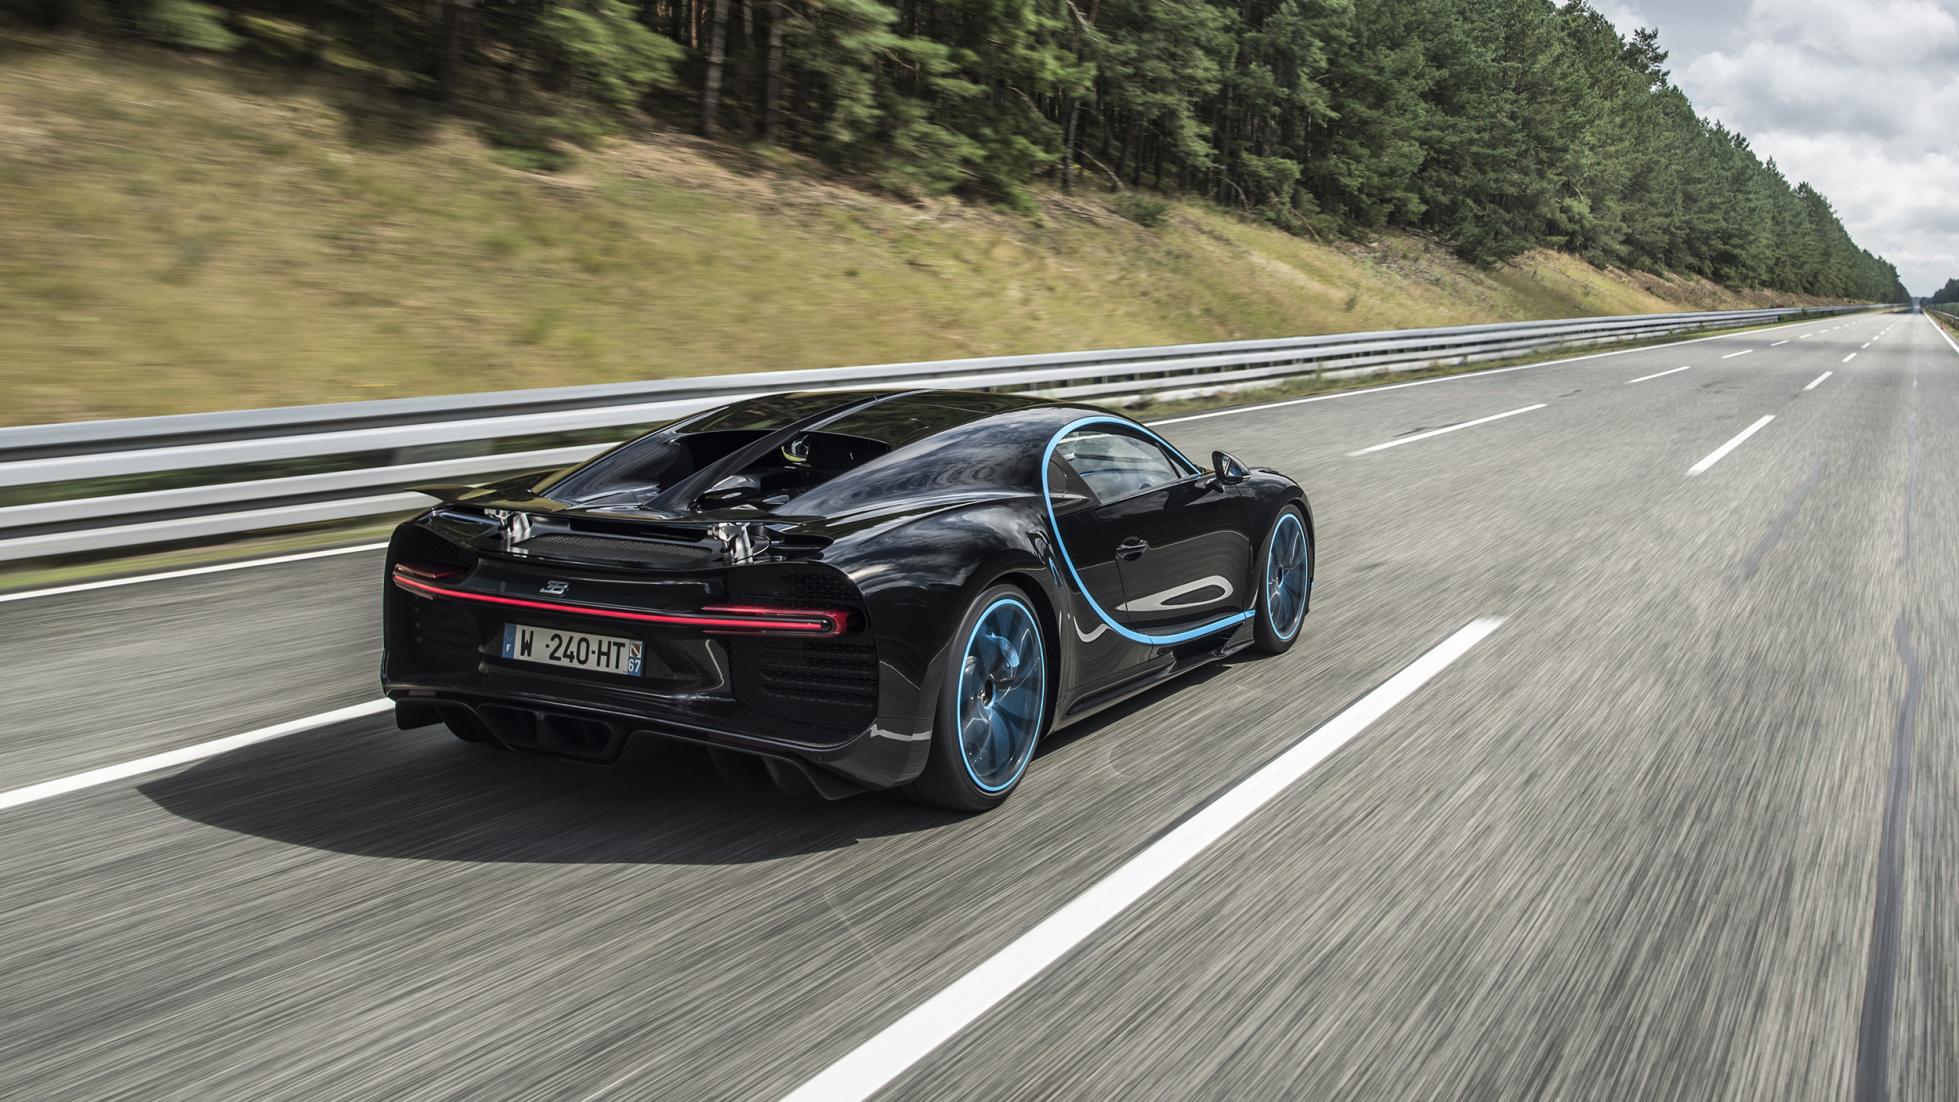 42-3 Amazing Bugatti Veyron Price In Australia Cars Trend